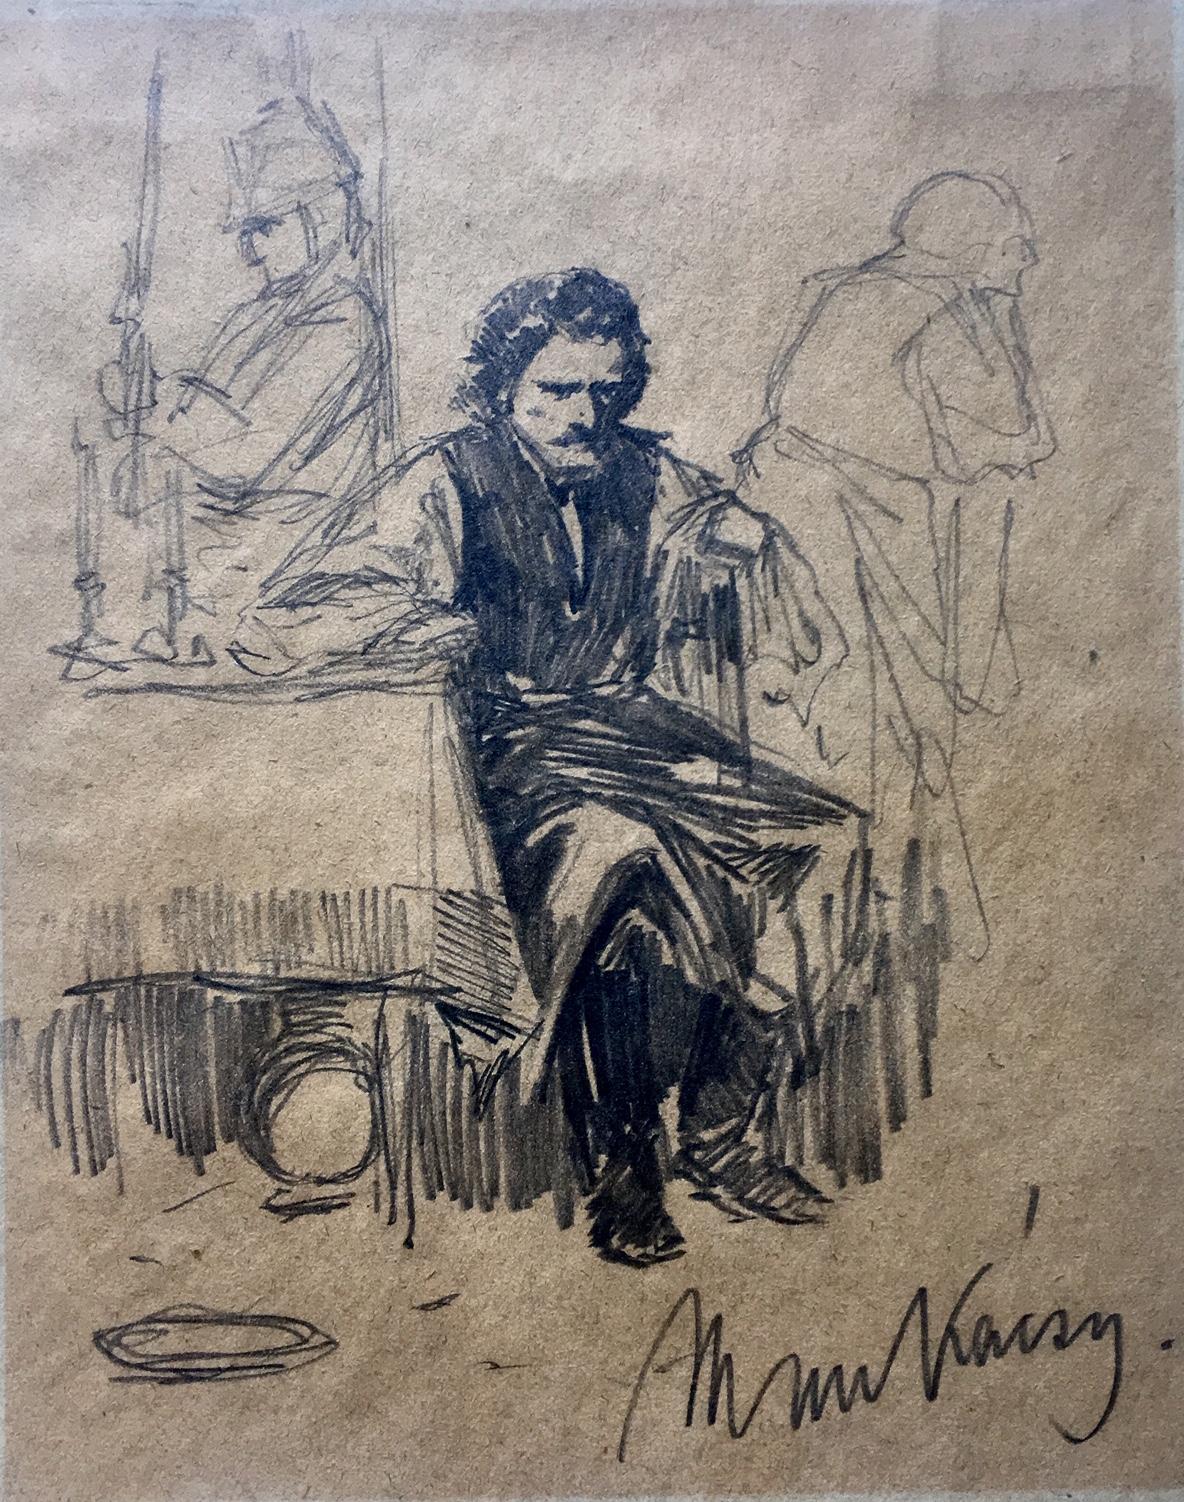 Munkácsy, Mihály: The condemned (study)